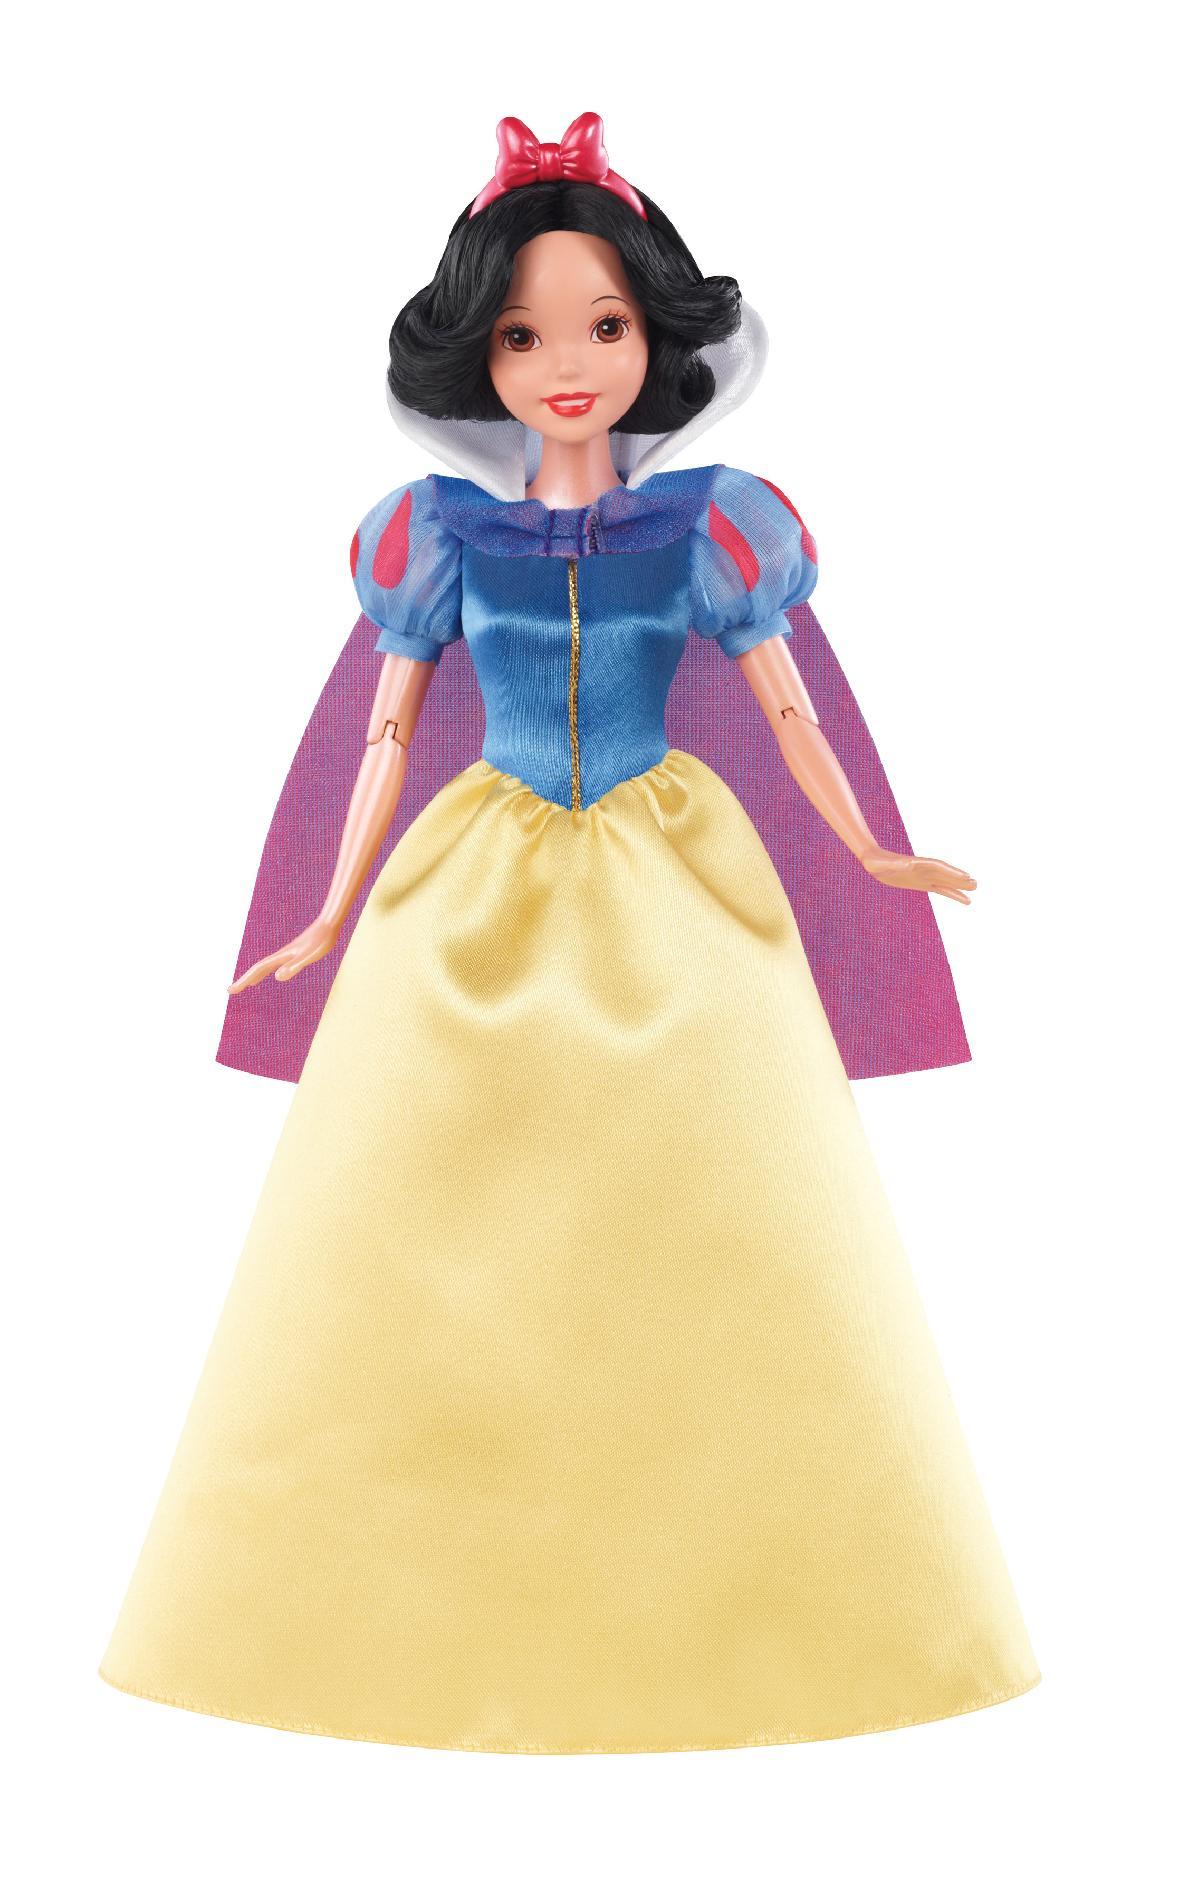 Disney Princess Signature Collection Classic Snow White Doll